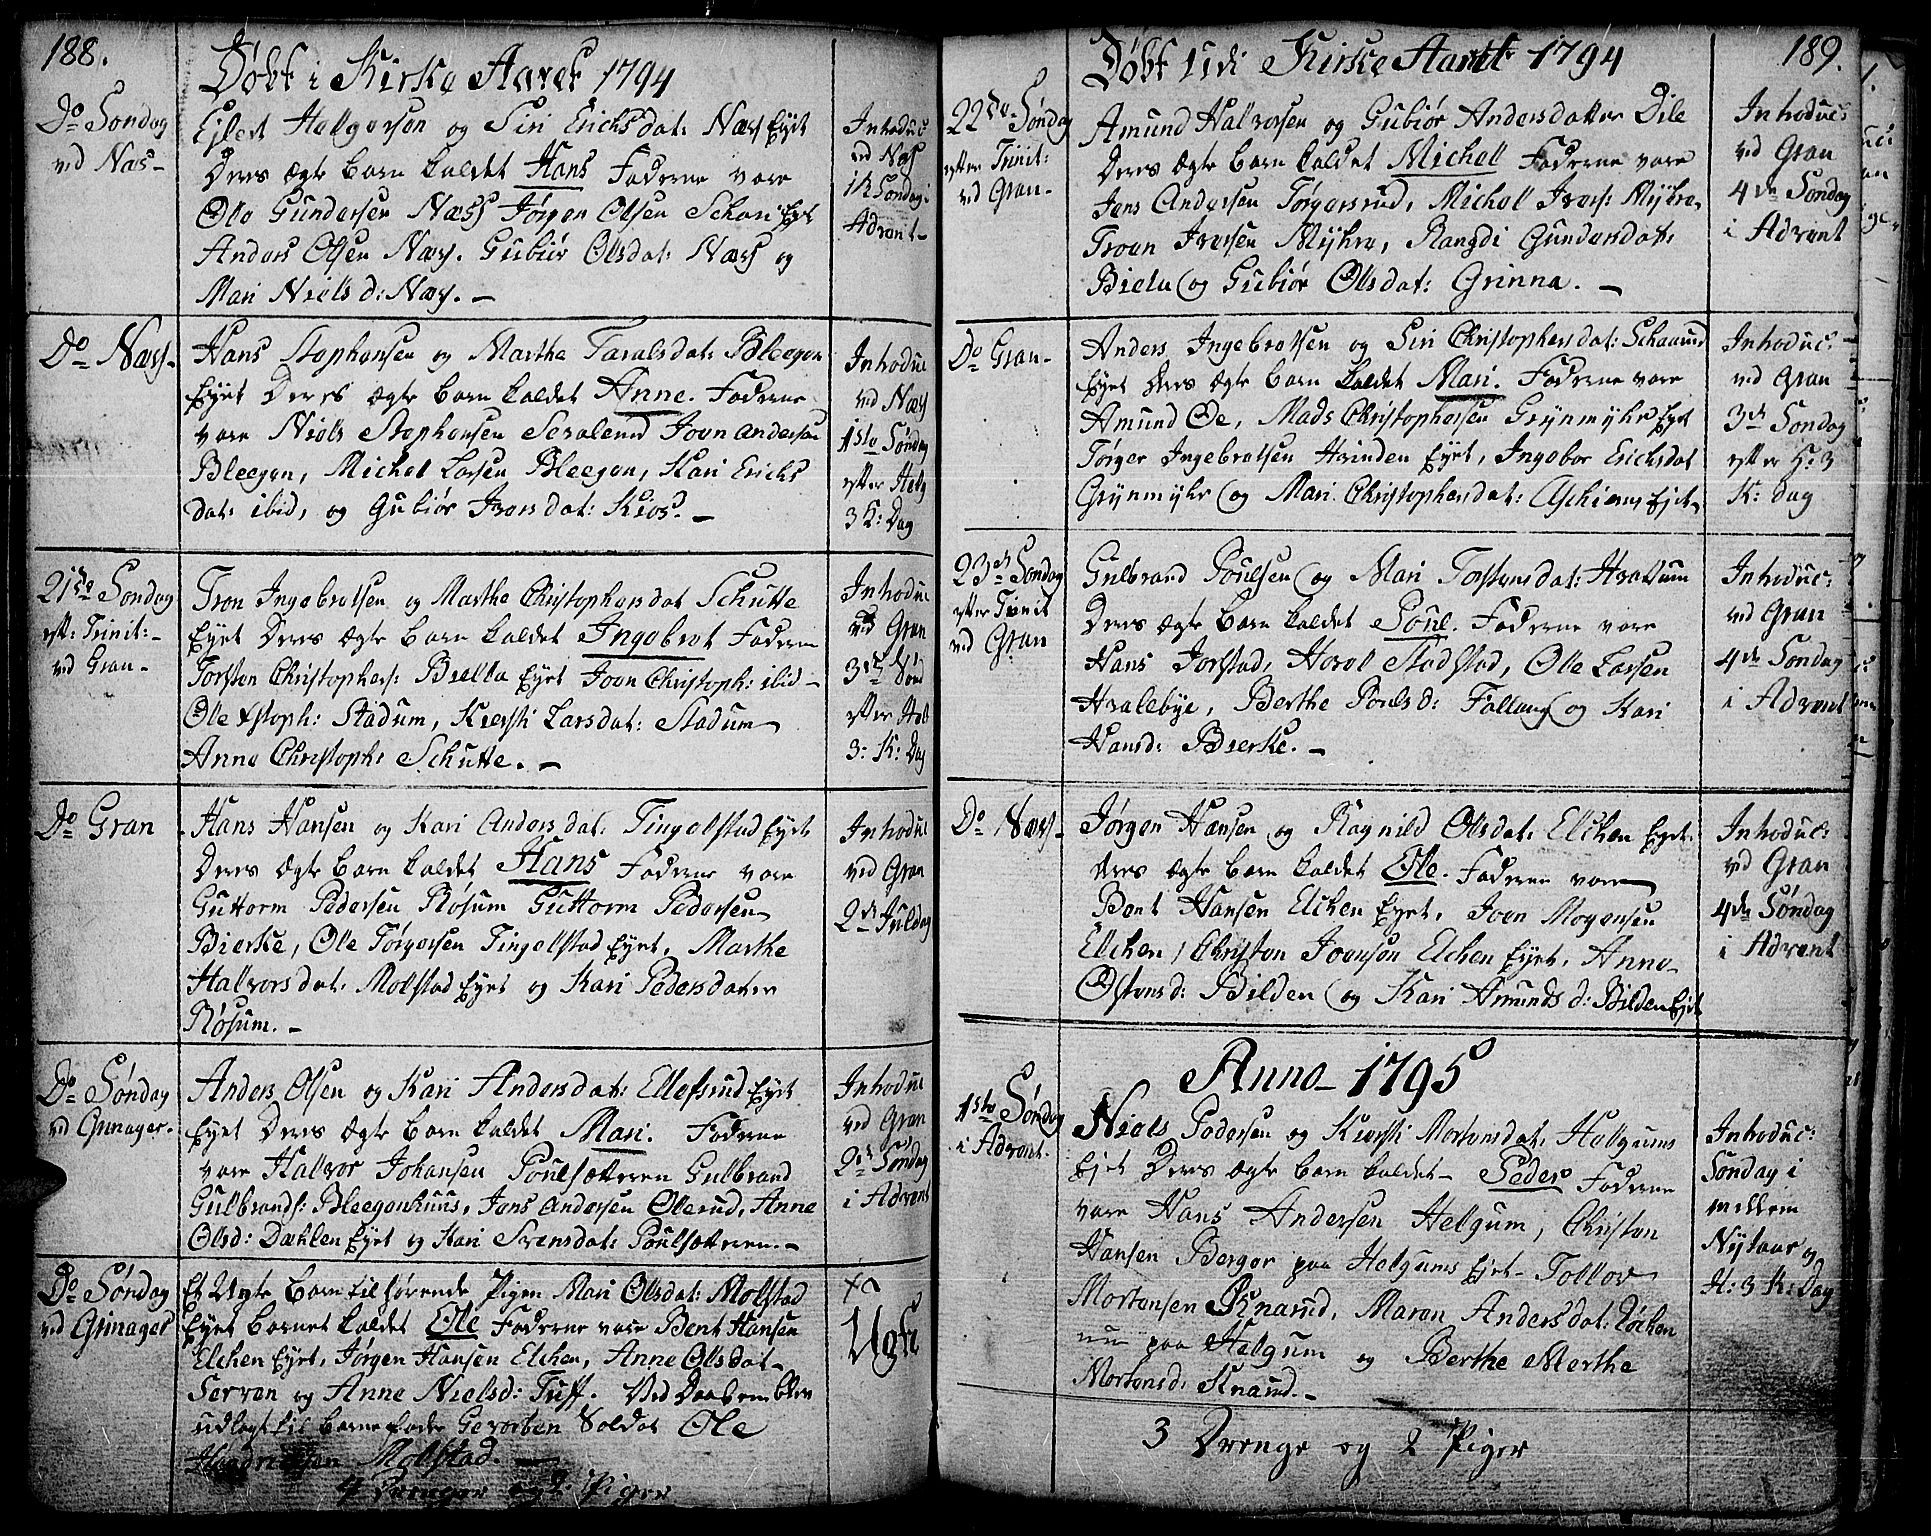 SAH, Gran prestekontor, Ministerialbok nr. 6, 1787-1824, s. 188-189